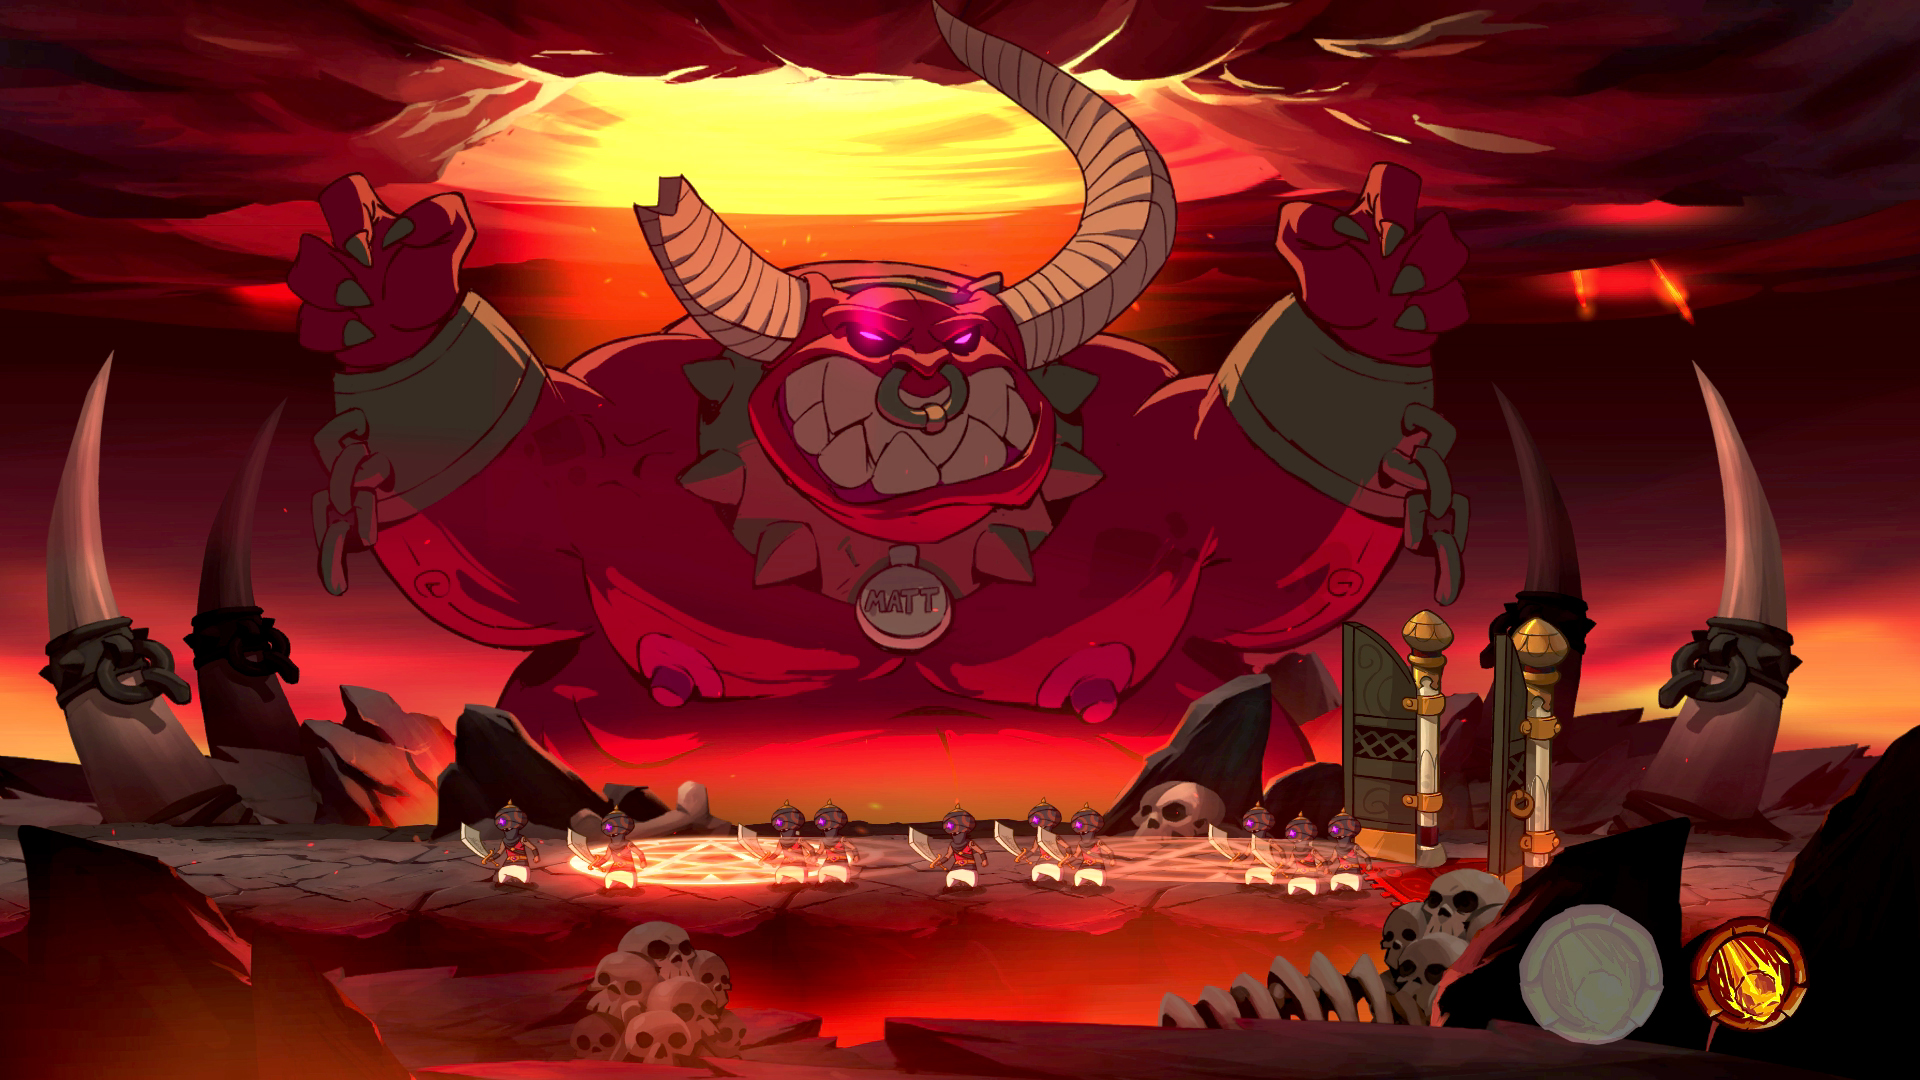 Nintendo Download: Swords and Soldiers 2 Shawarmageddon screenshot